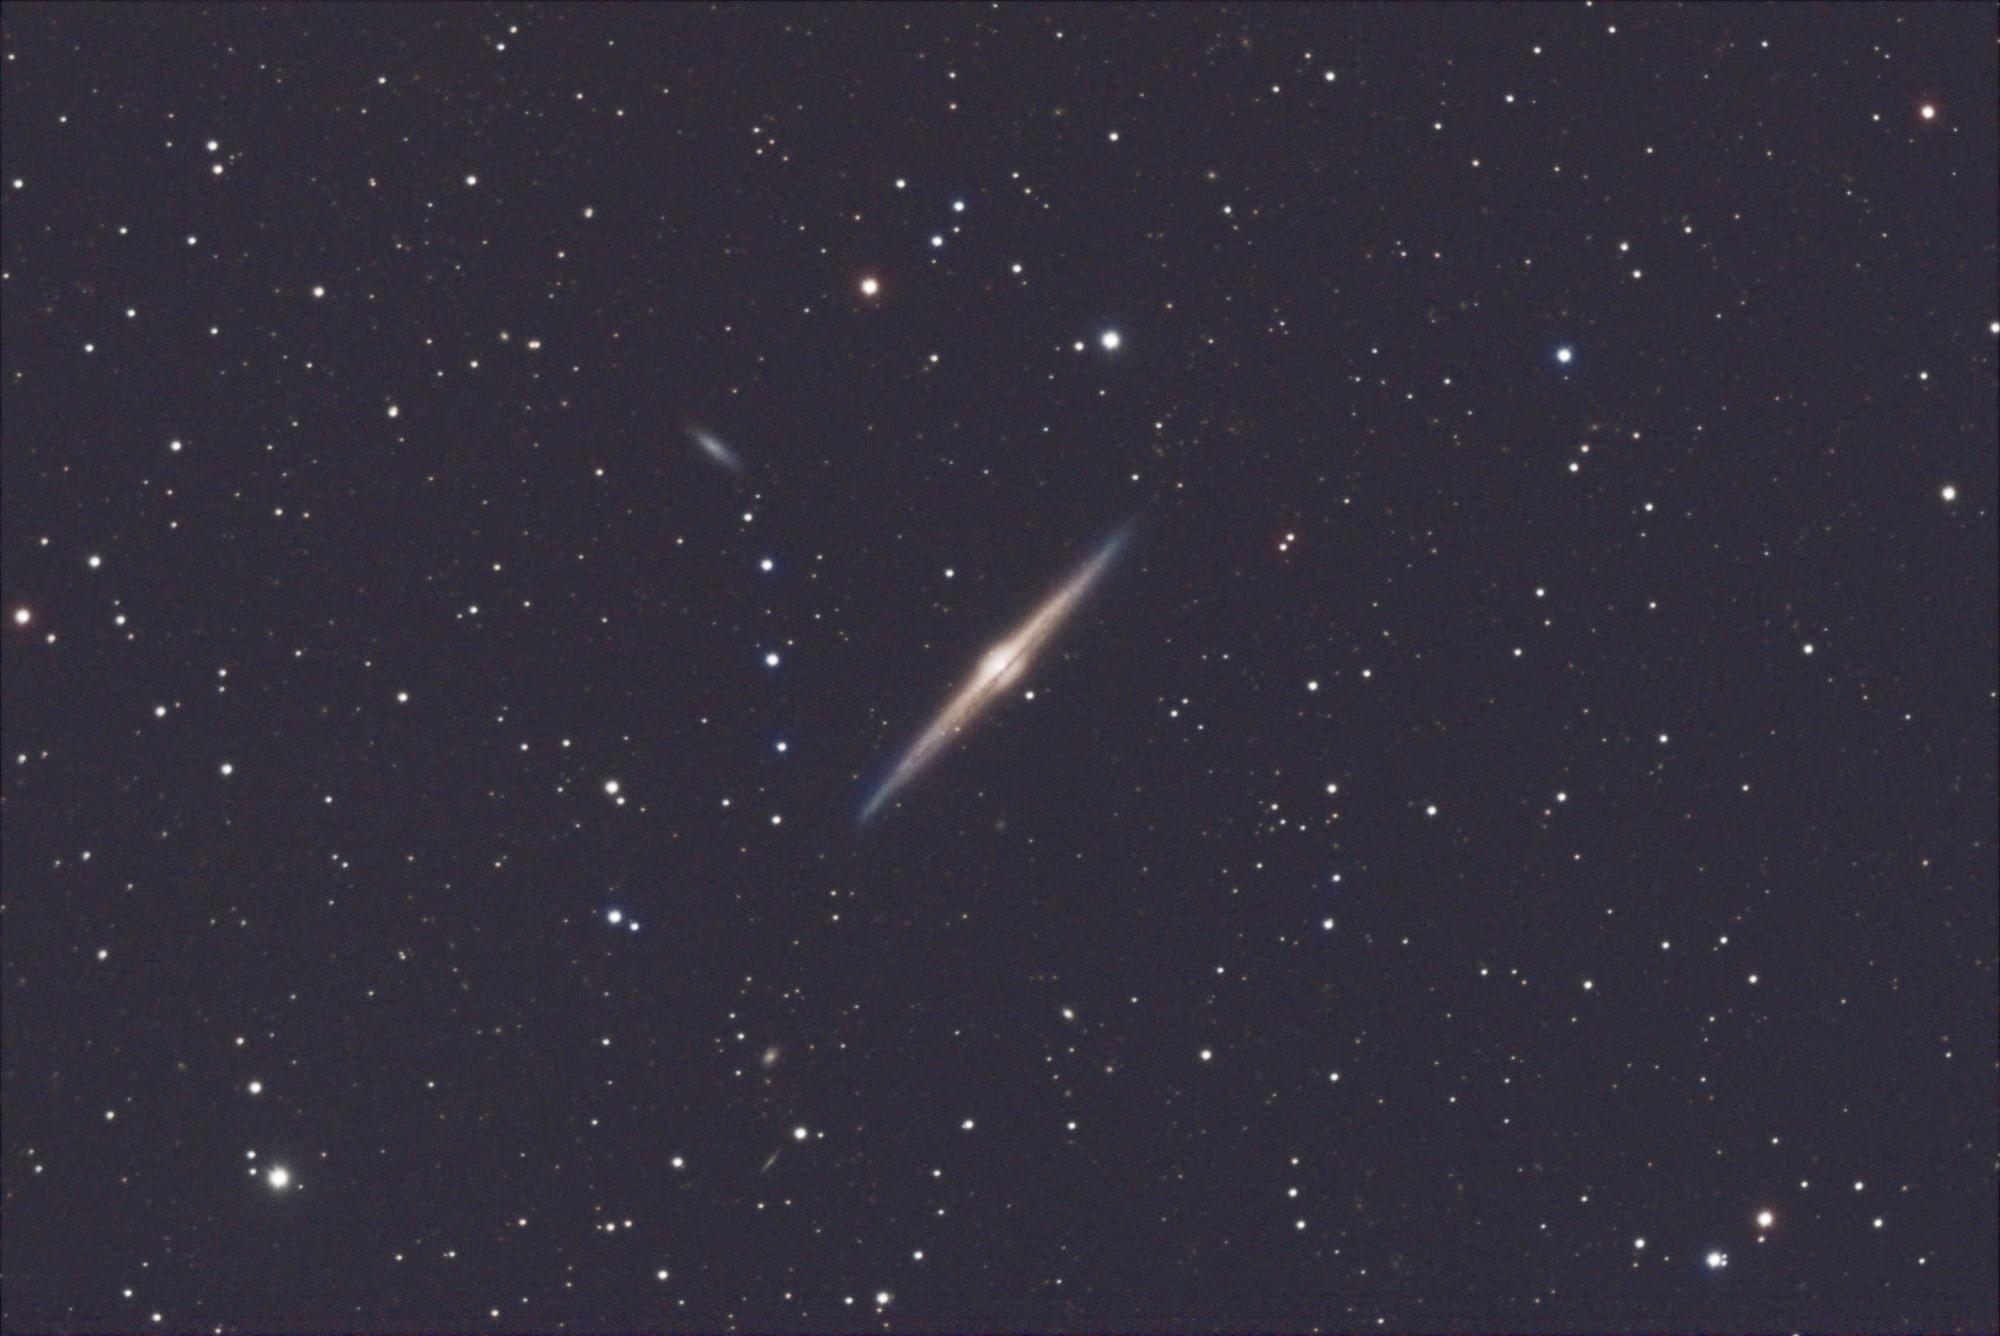 NGC4565 ITNT02 20210114 Col BIN1 20MN FIN.jpg